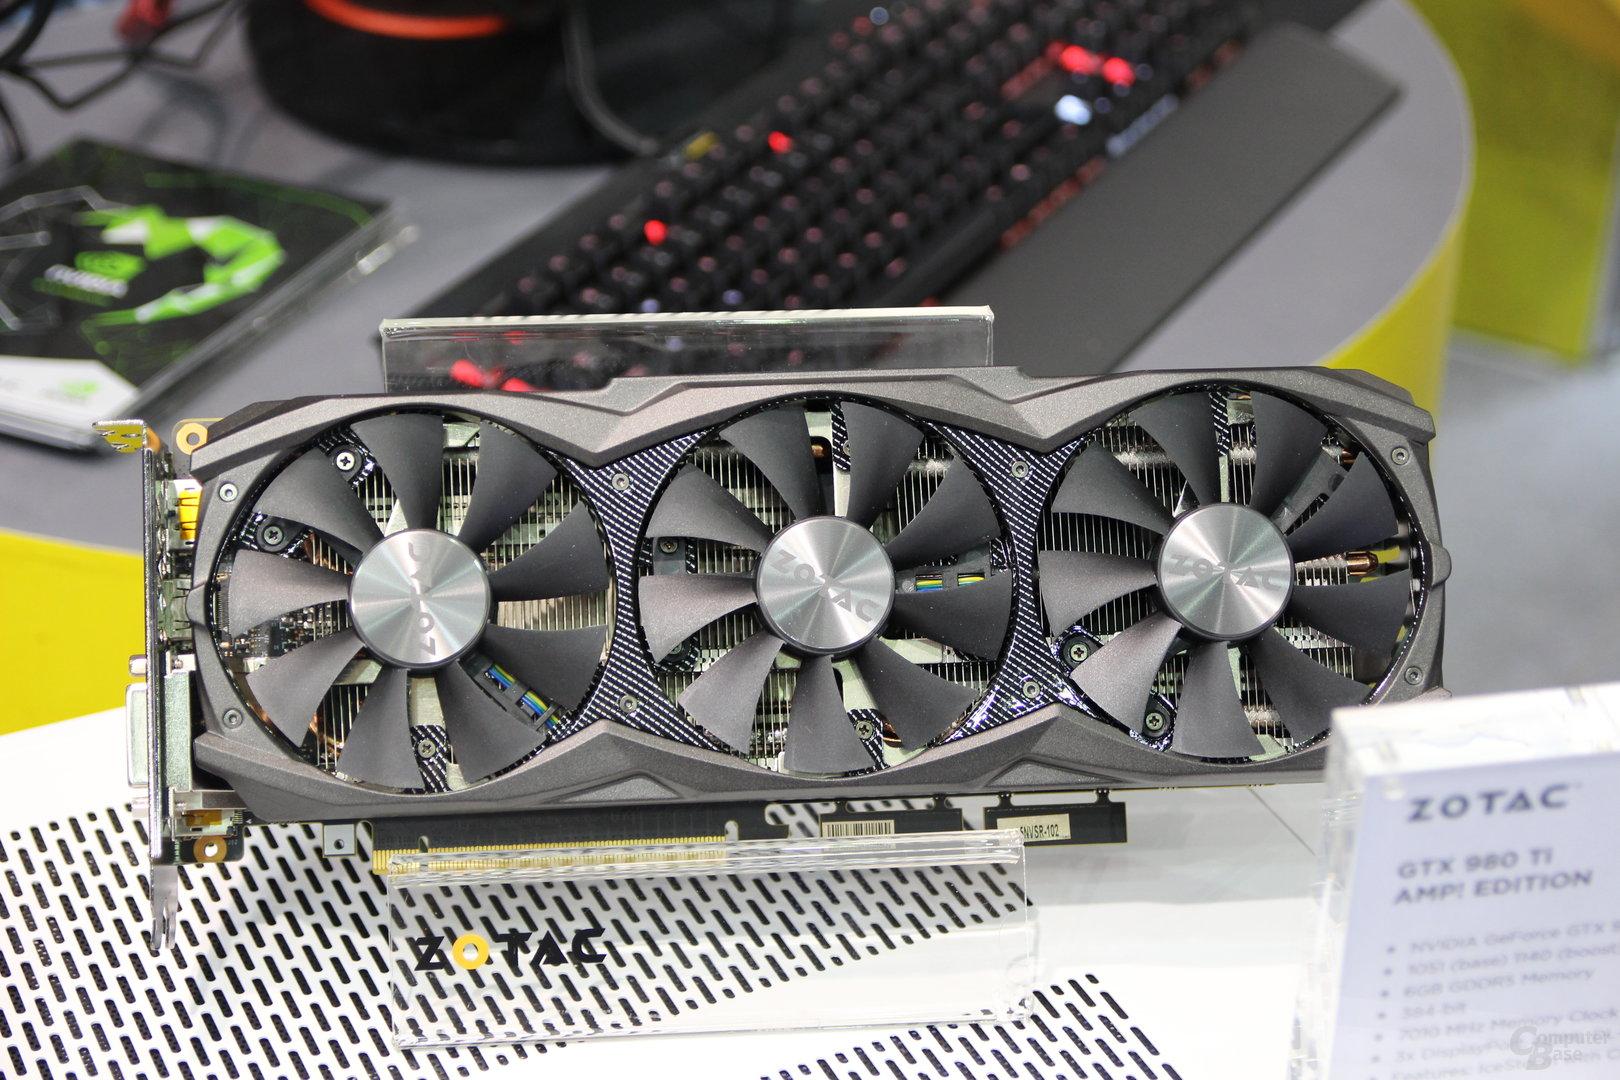 Zotac GeForce GTX 980 Ti AMP!